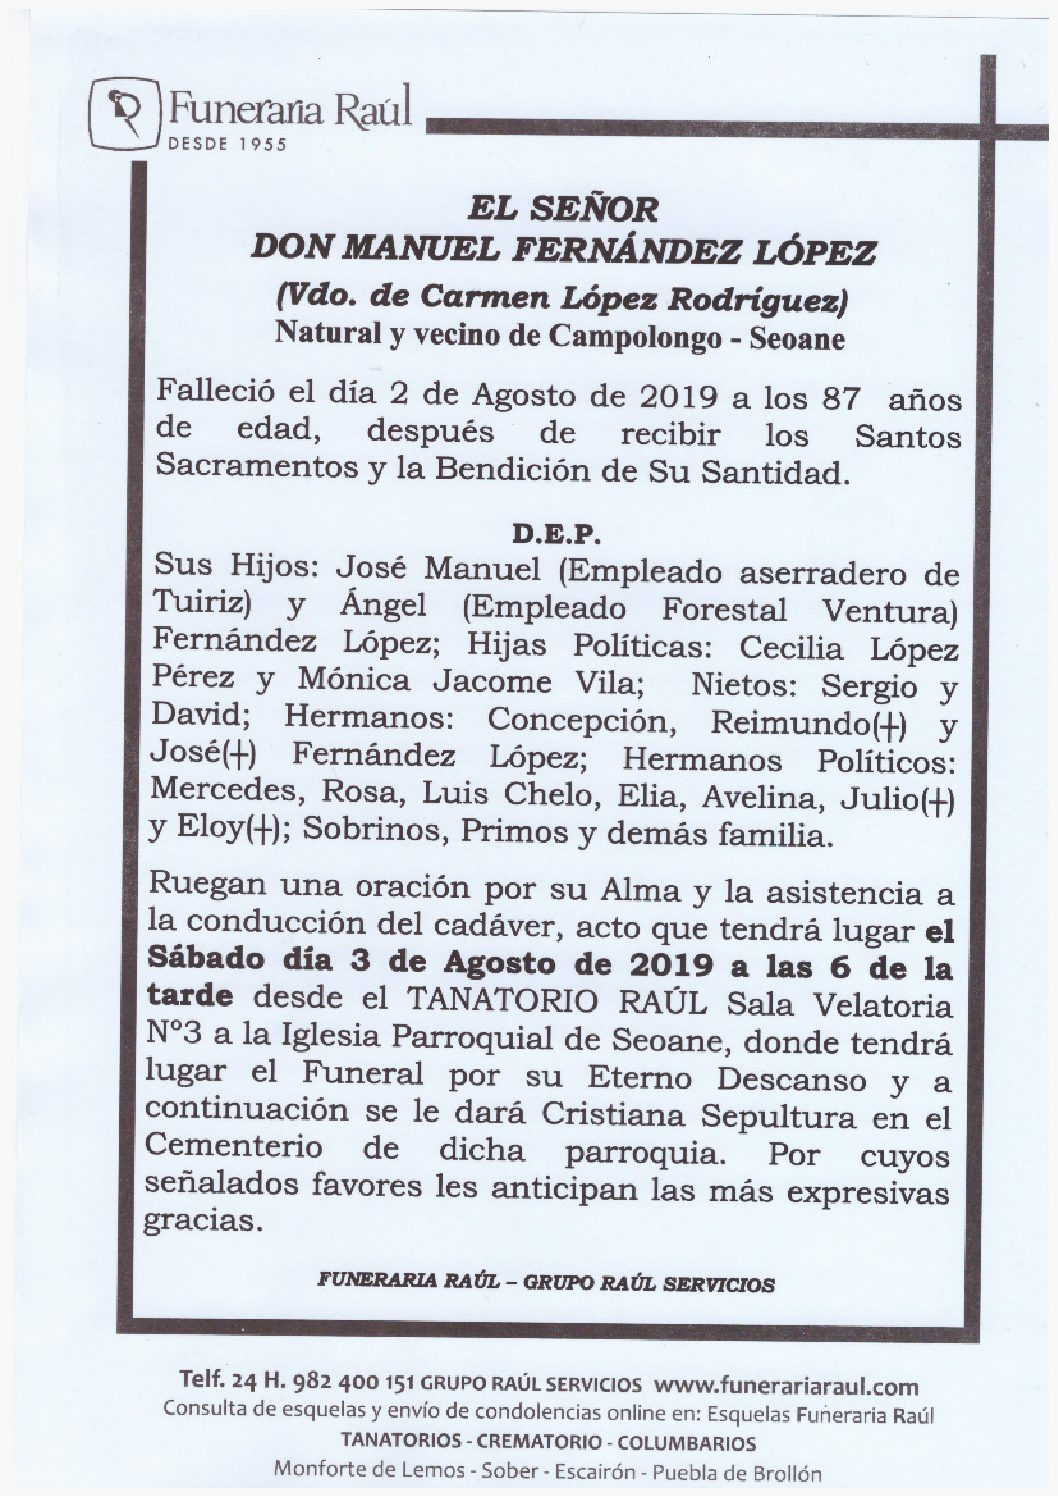 DON MANUEL FERNANDEZ LOPEZ